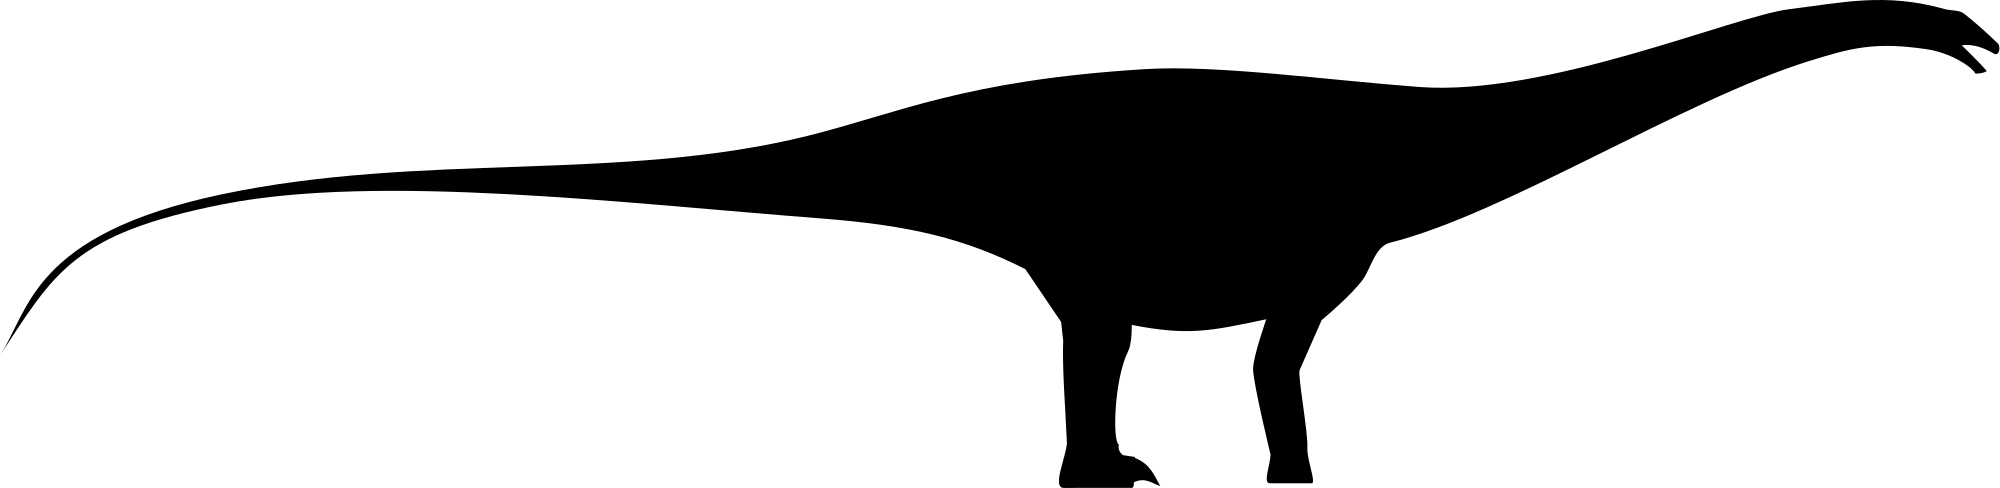 File silhouette svg wikimedia. Dinosaurs clipart apatosaurus